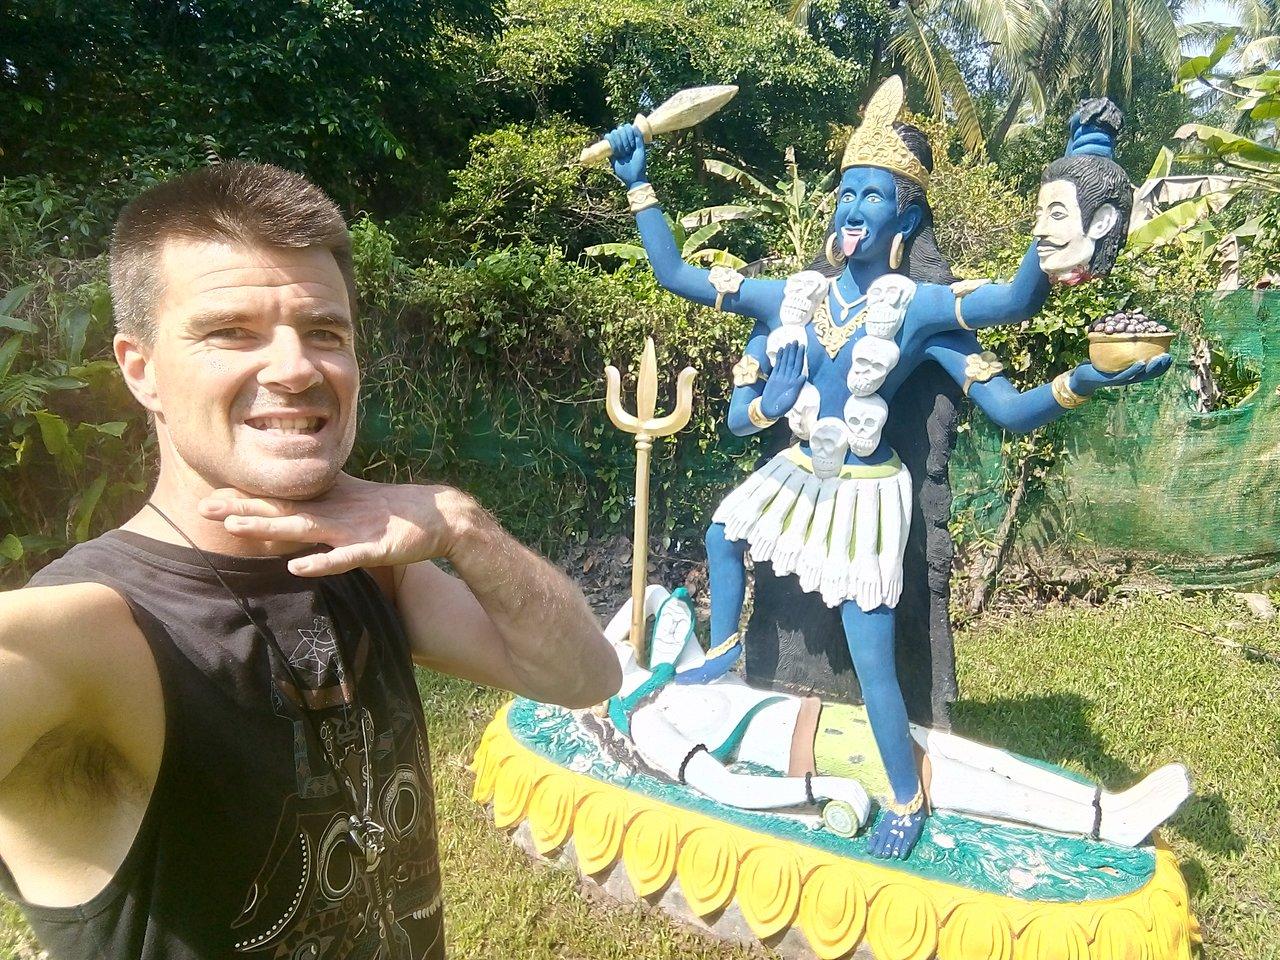 Agama Yoga Ko Pha Ngan 2020 All You Need To Know Before You Go With Photos Tripadvisor